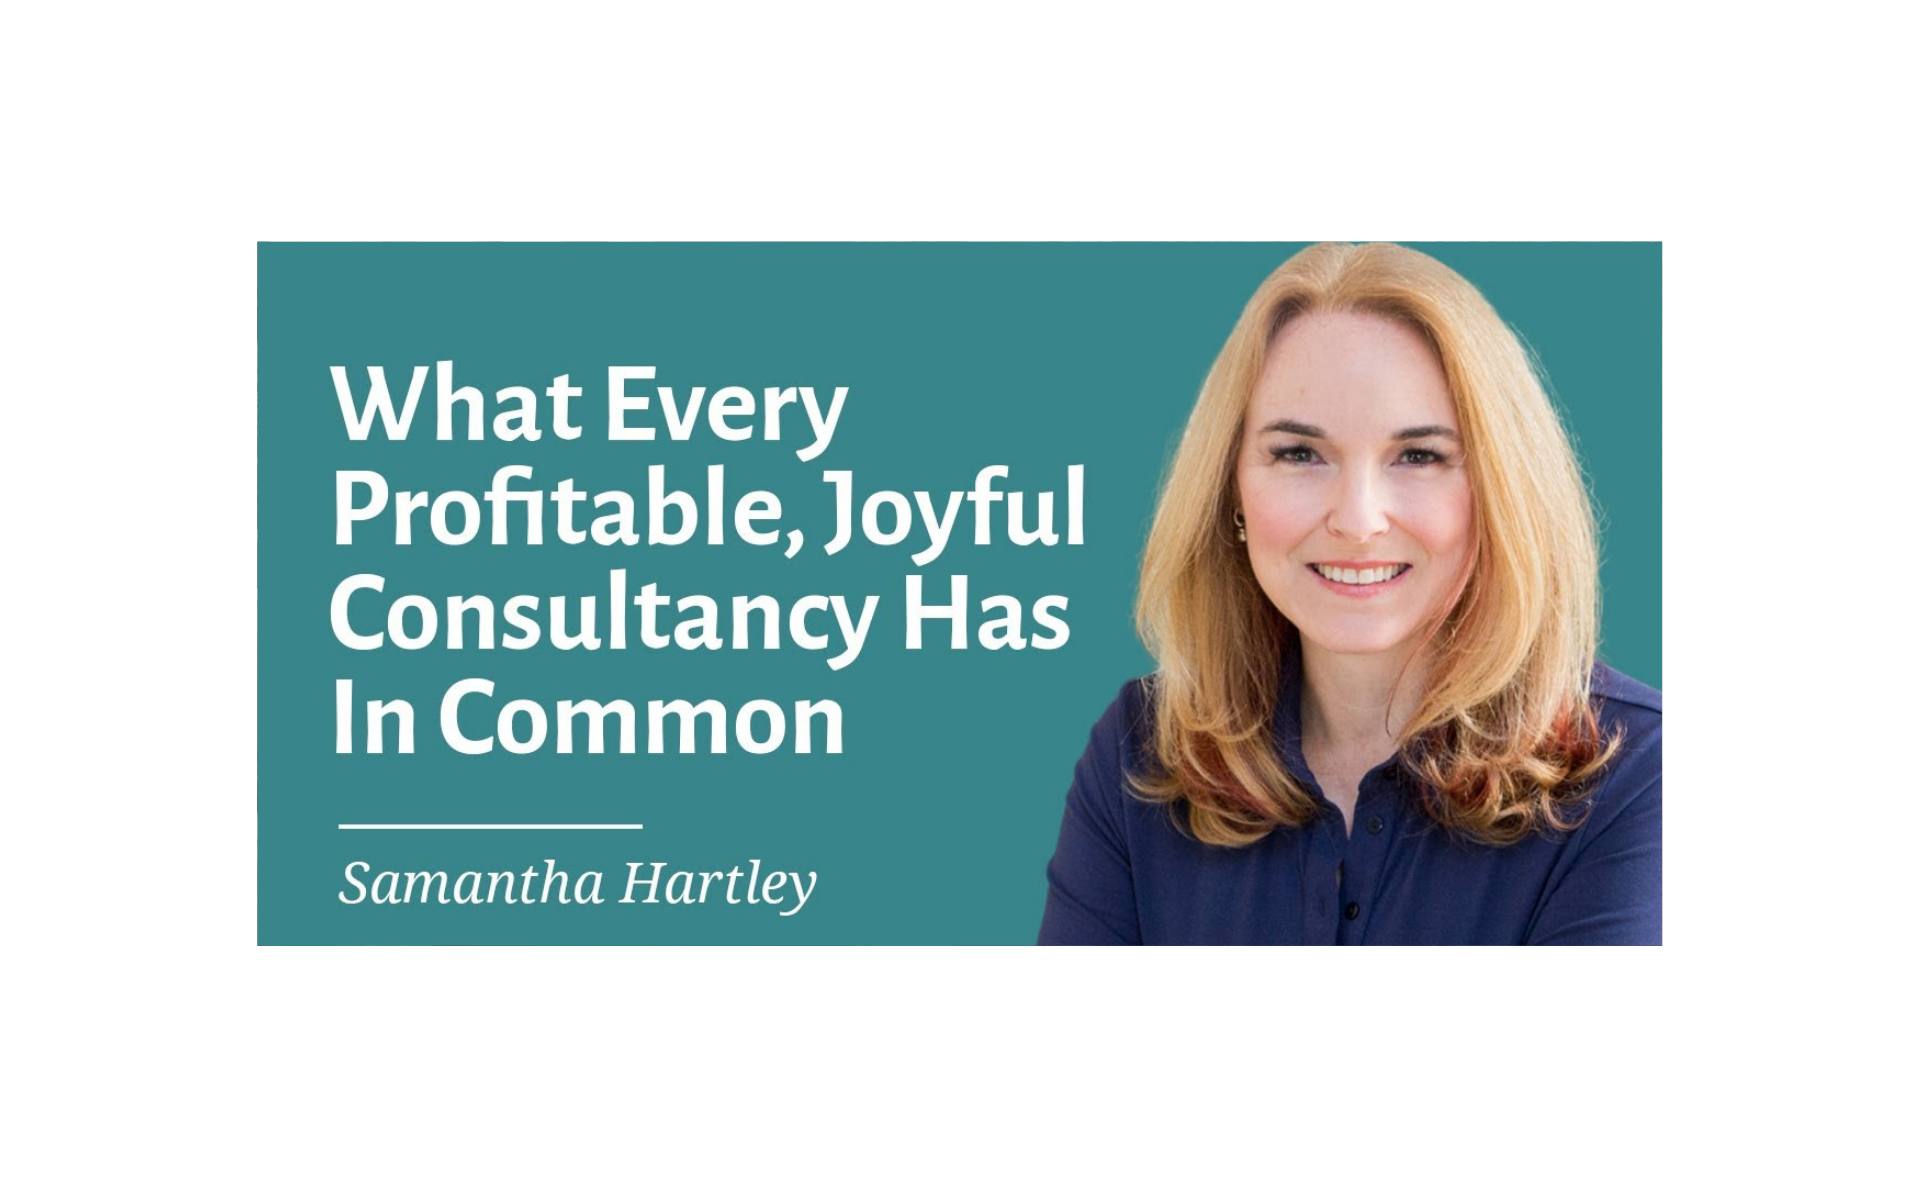 What Every Profitable, Joyful Consultancy Has In Common